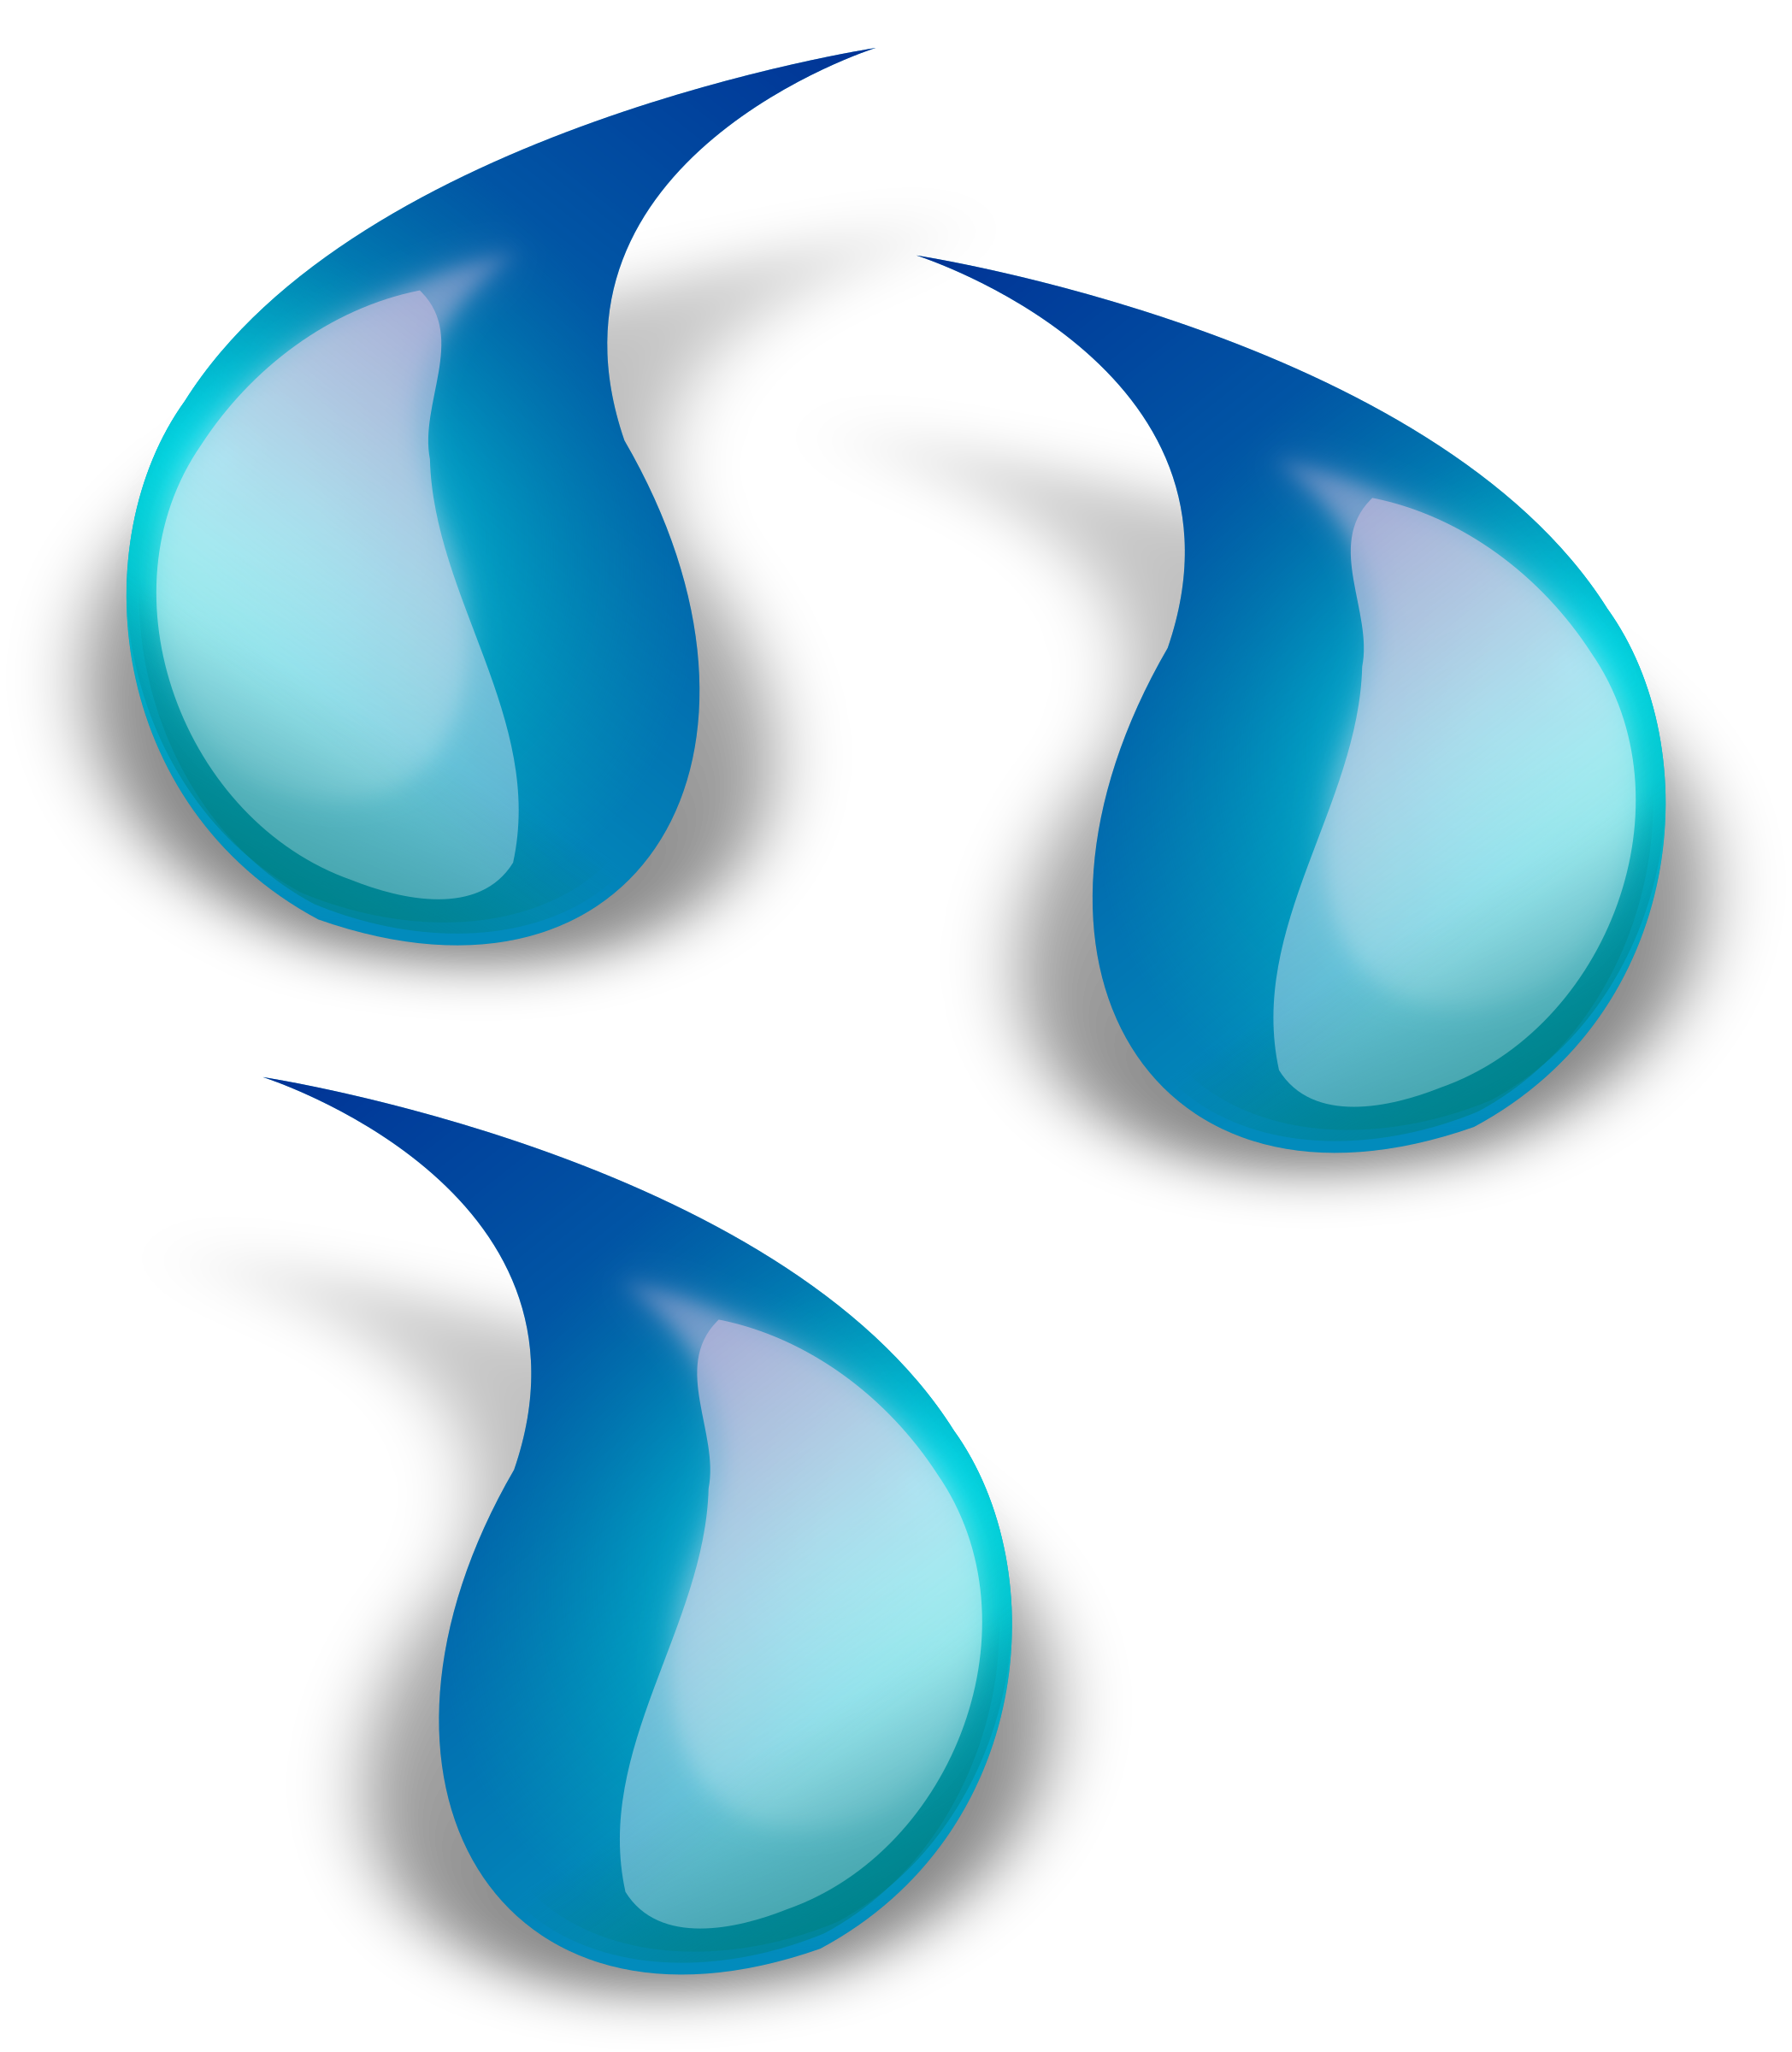 Water drop big image. Splash clipart blue slime